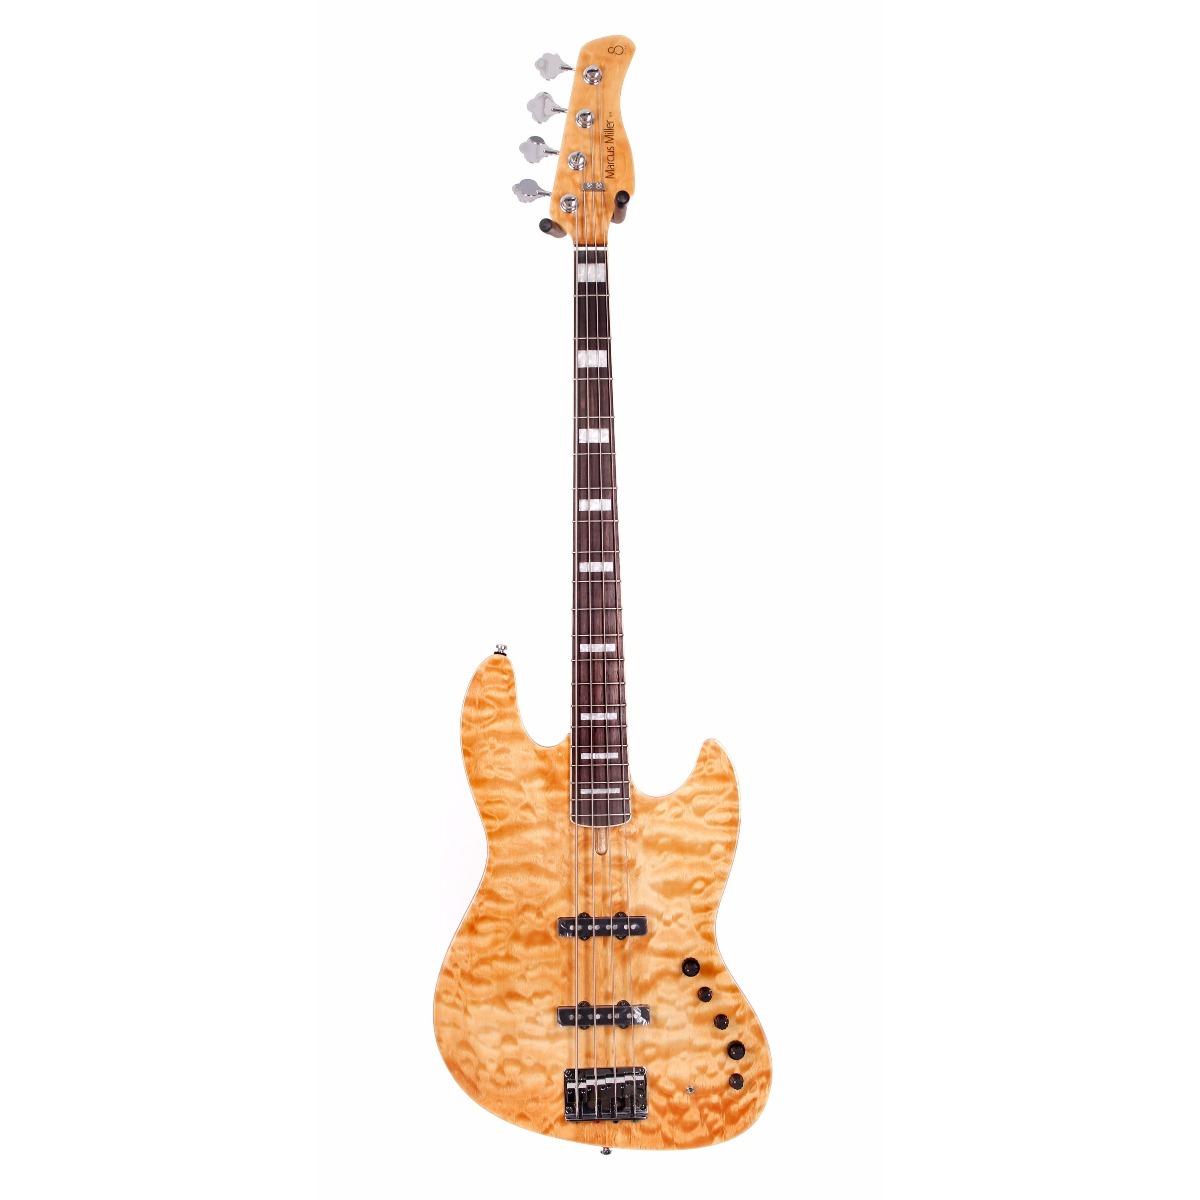 Sire Marcus Miller V9 SWAMP ASH-4 NT el-bas natur